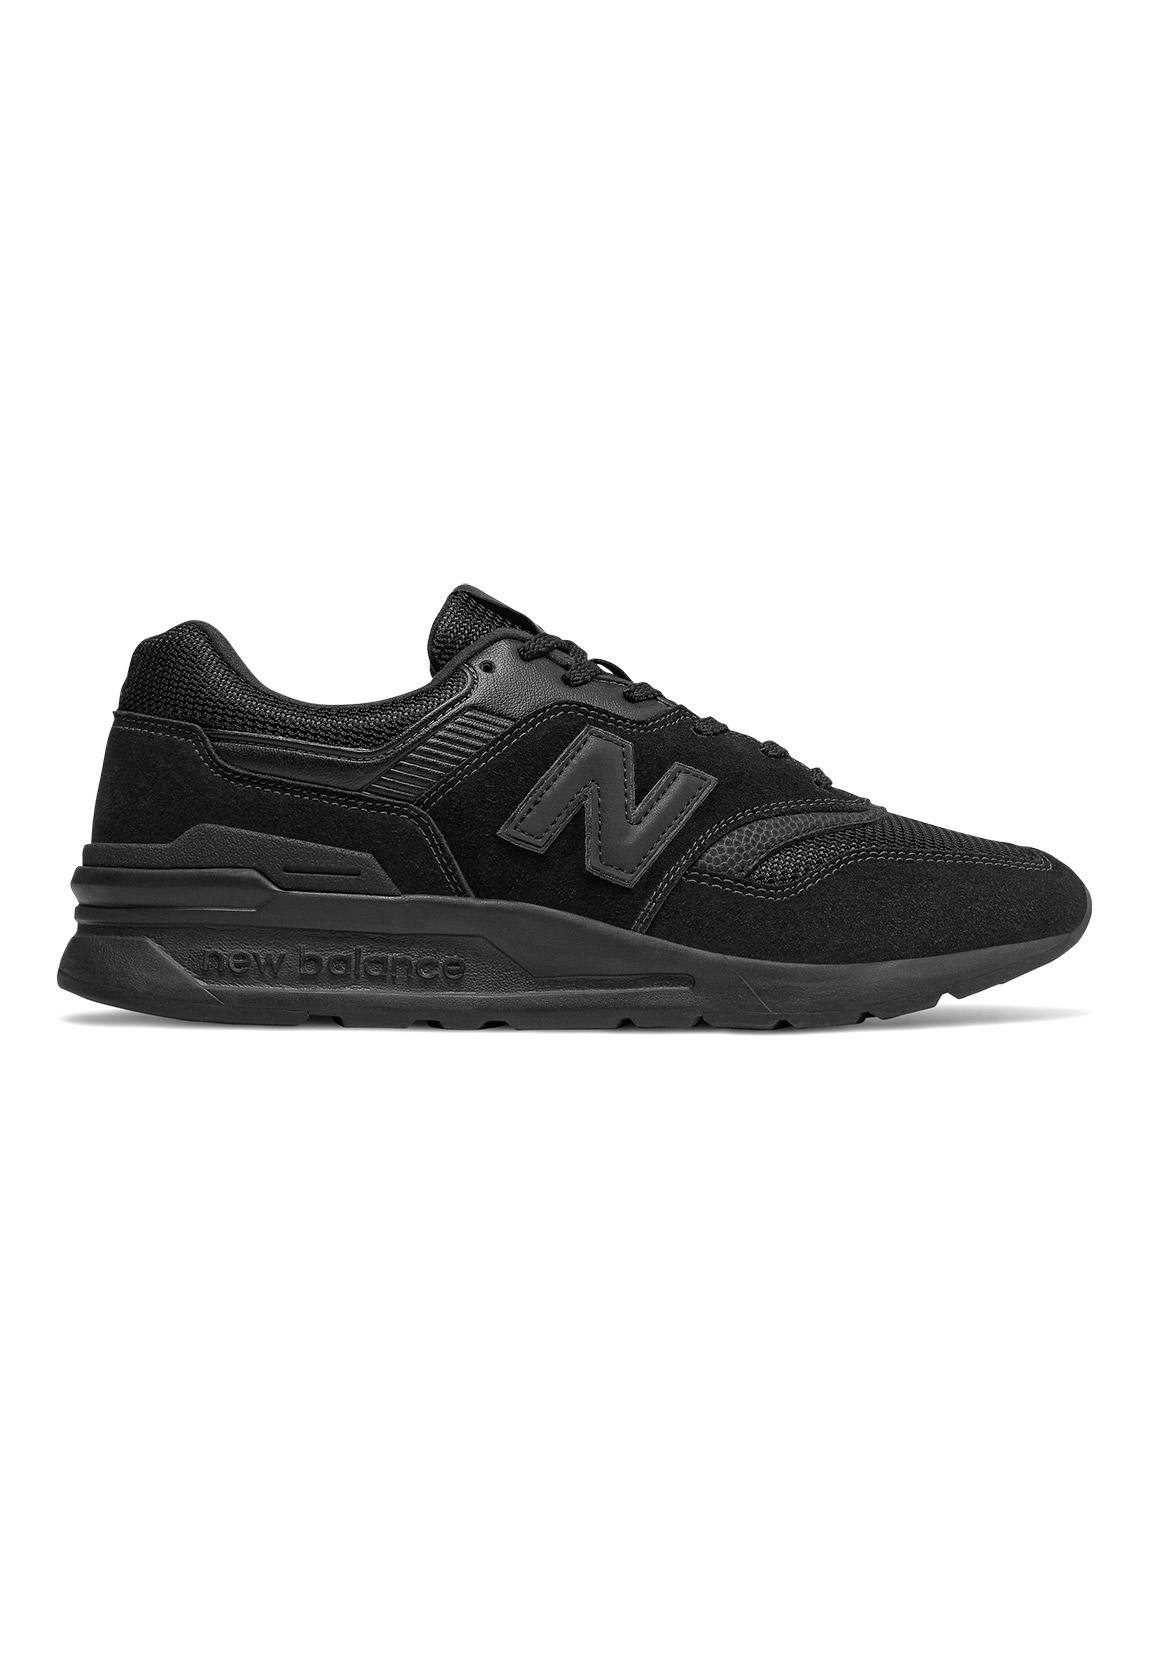 New Balance Sneaker Herren CM997HCI Schwarz Black